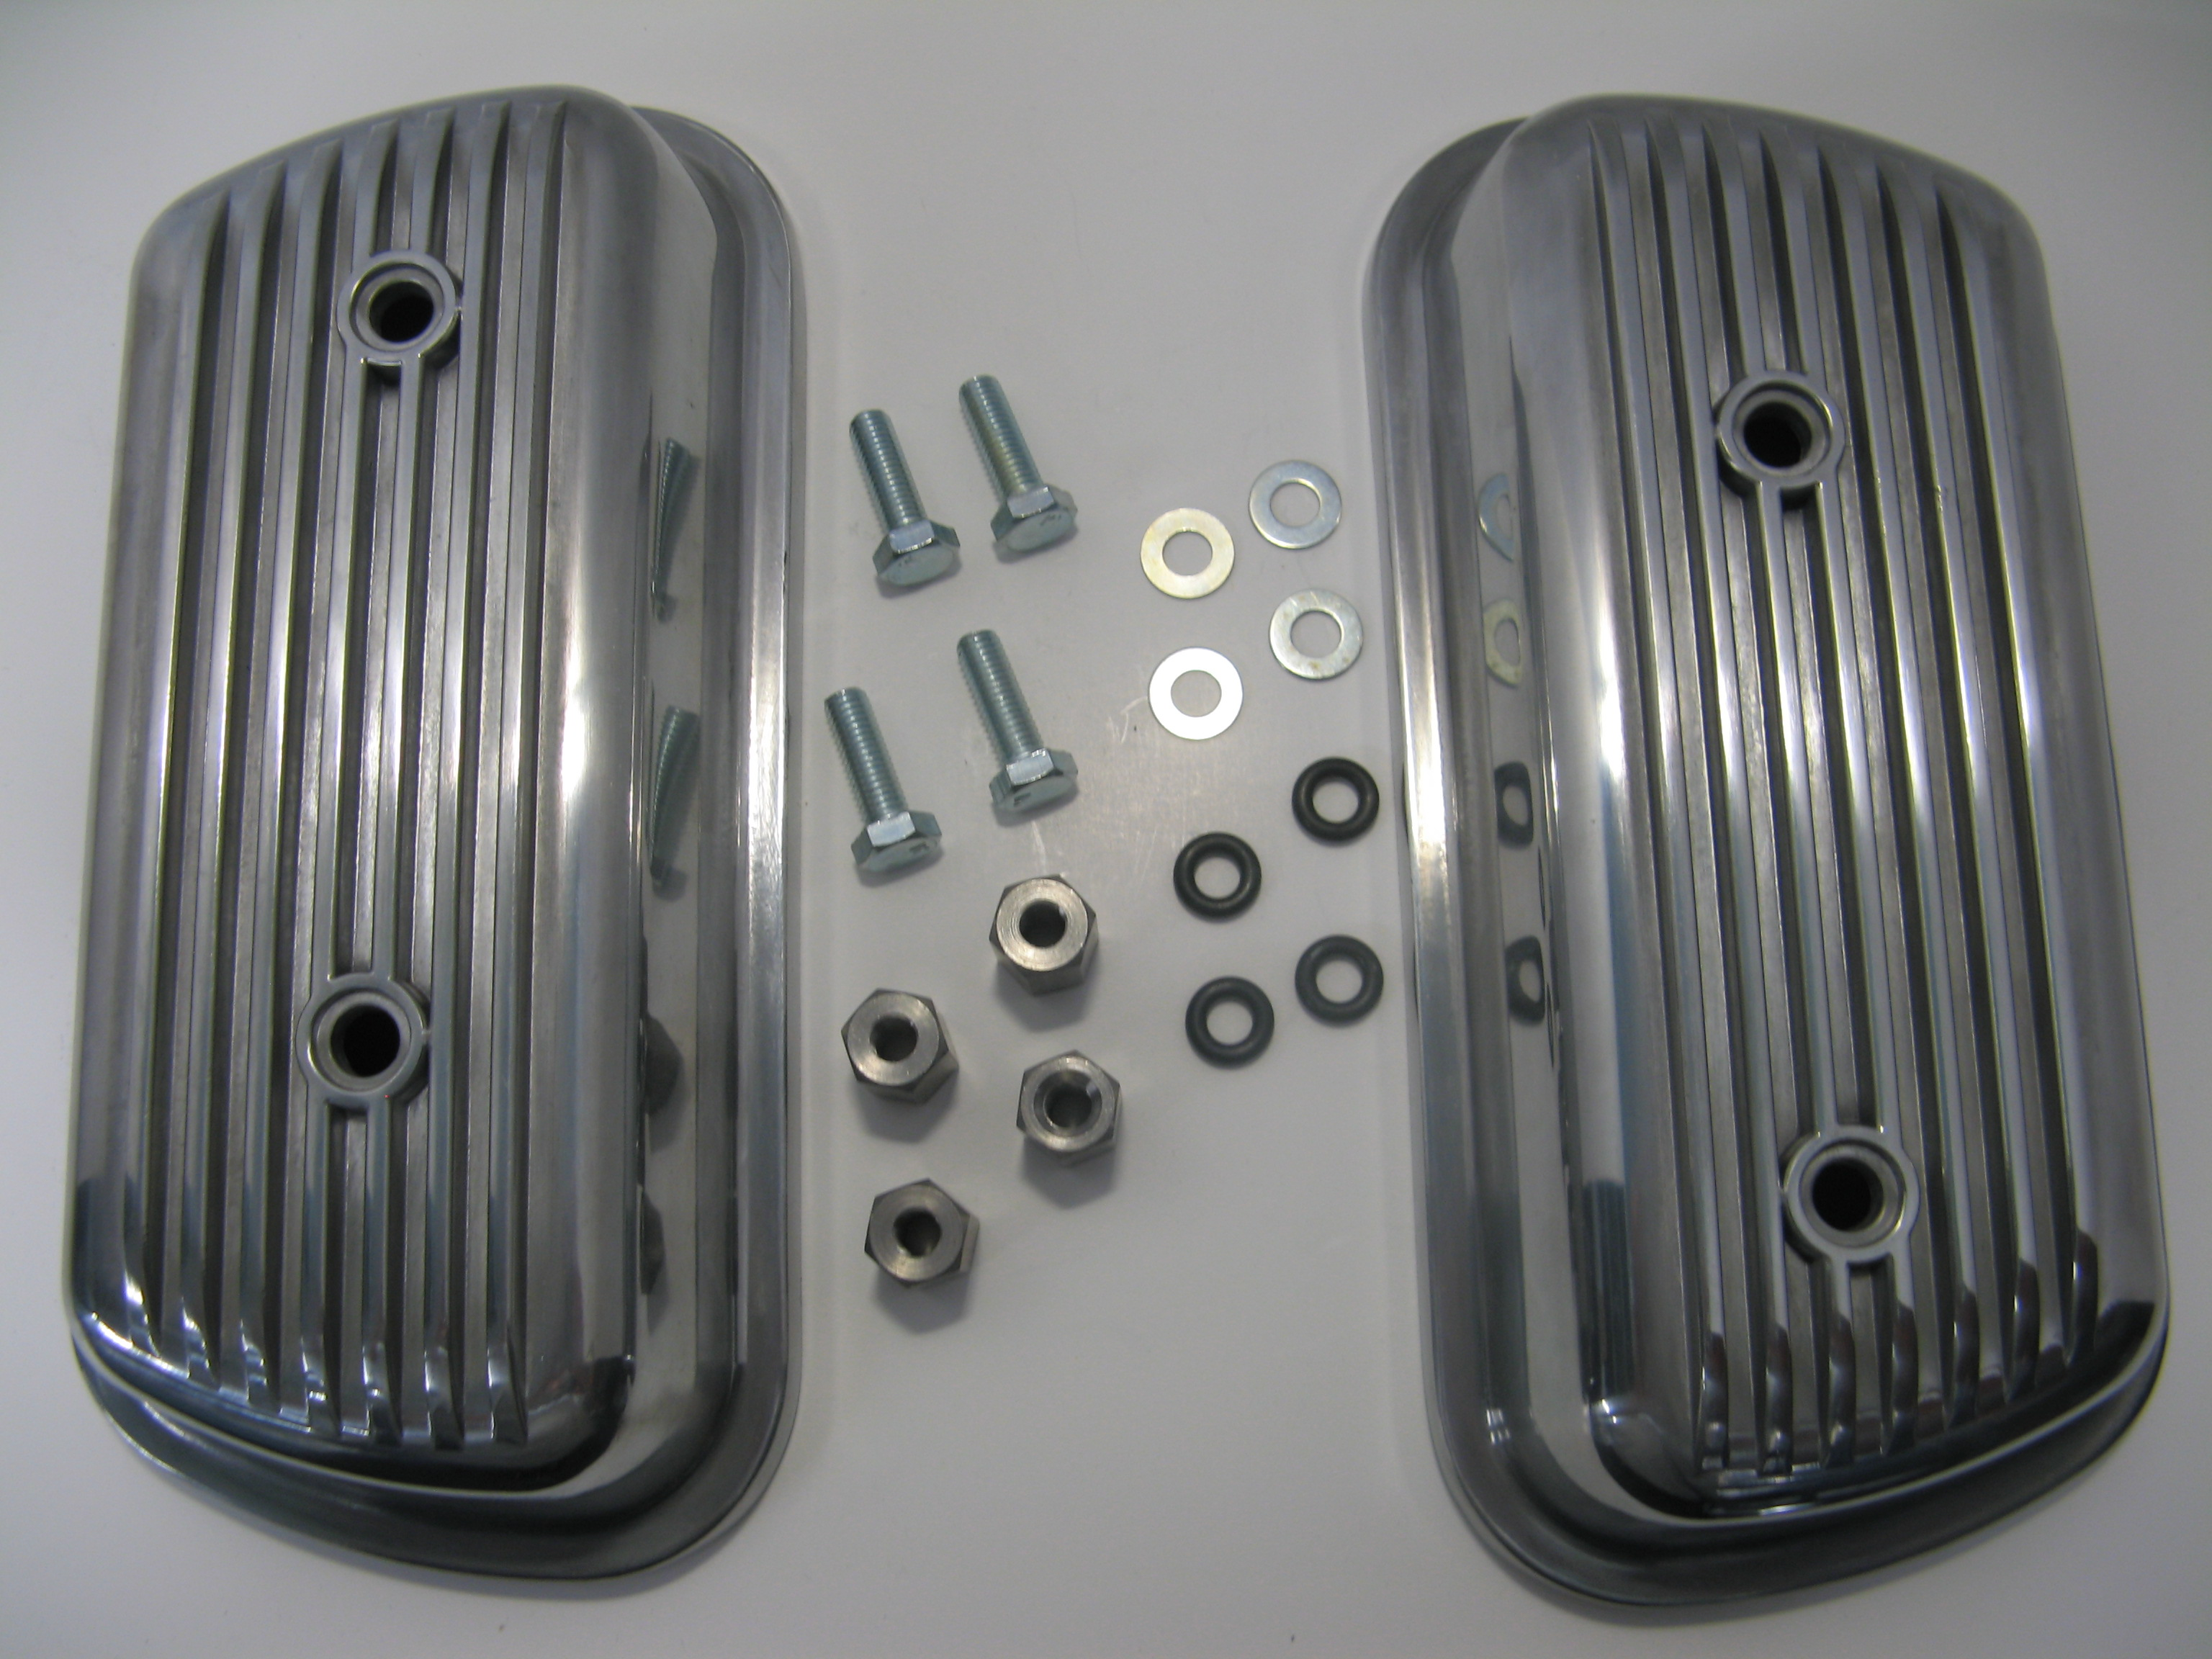 Aluminum Valve Covers Bolt On W Hw 1200cc 1600cc Pair - ACCC105117